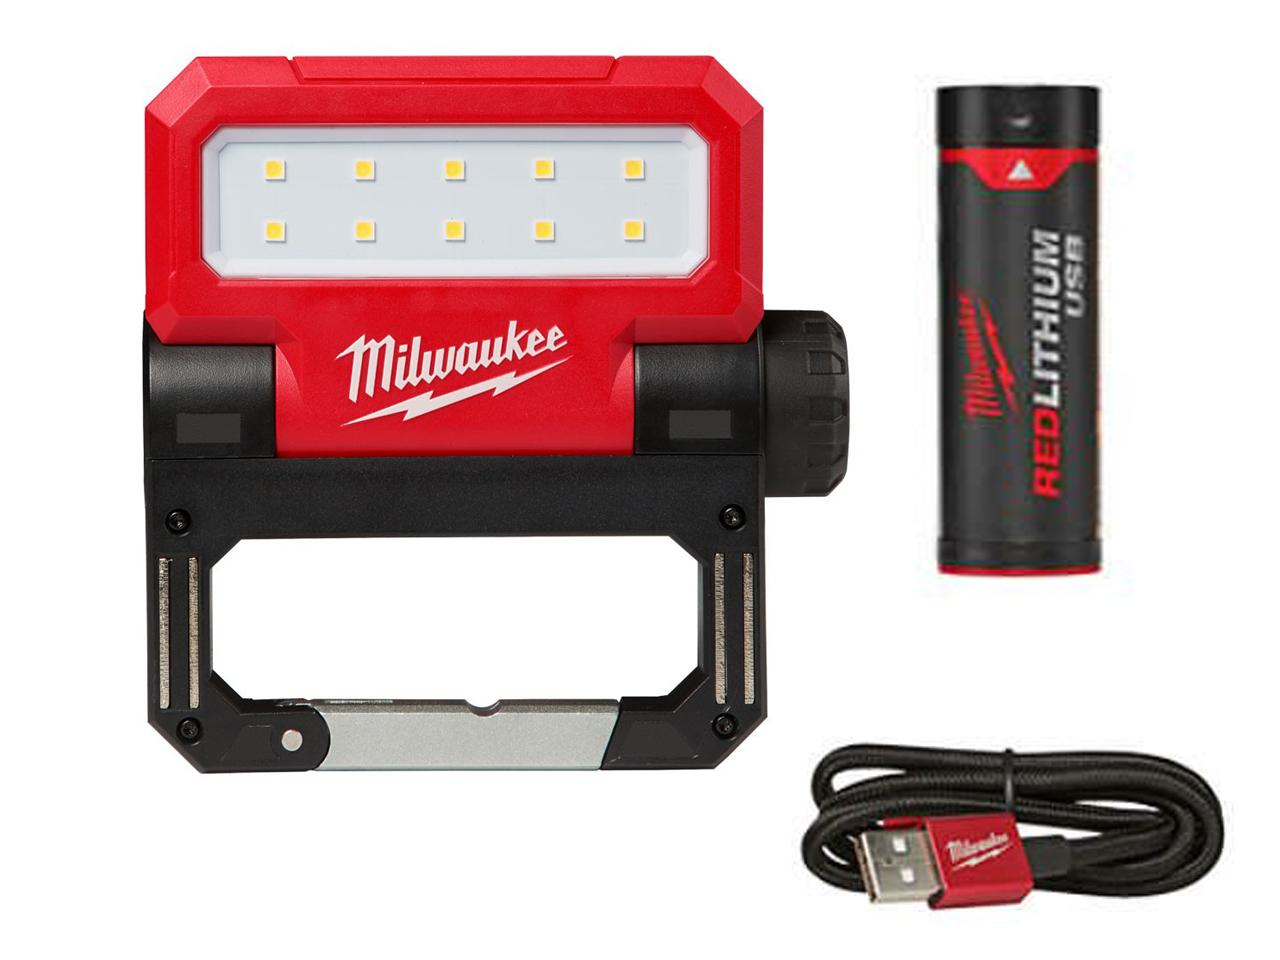 Milwaukee L4FFL Flood Light Usb Rechargeable Folding 4933464352